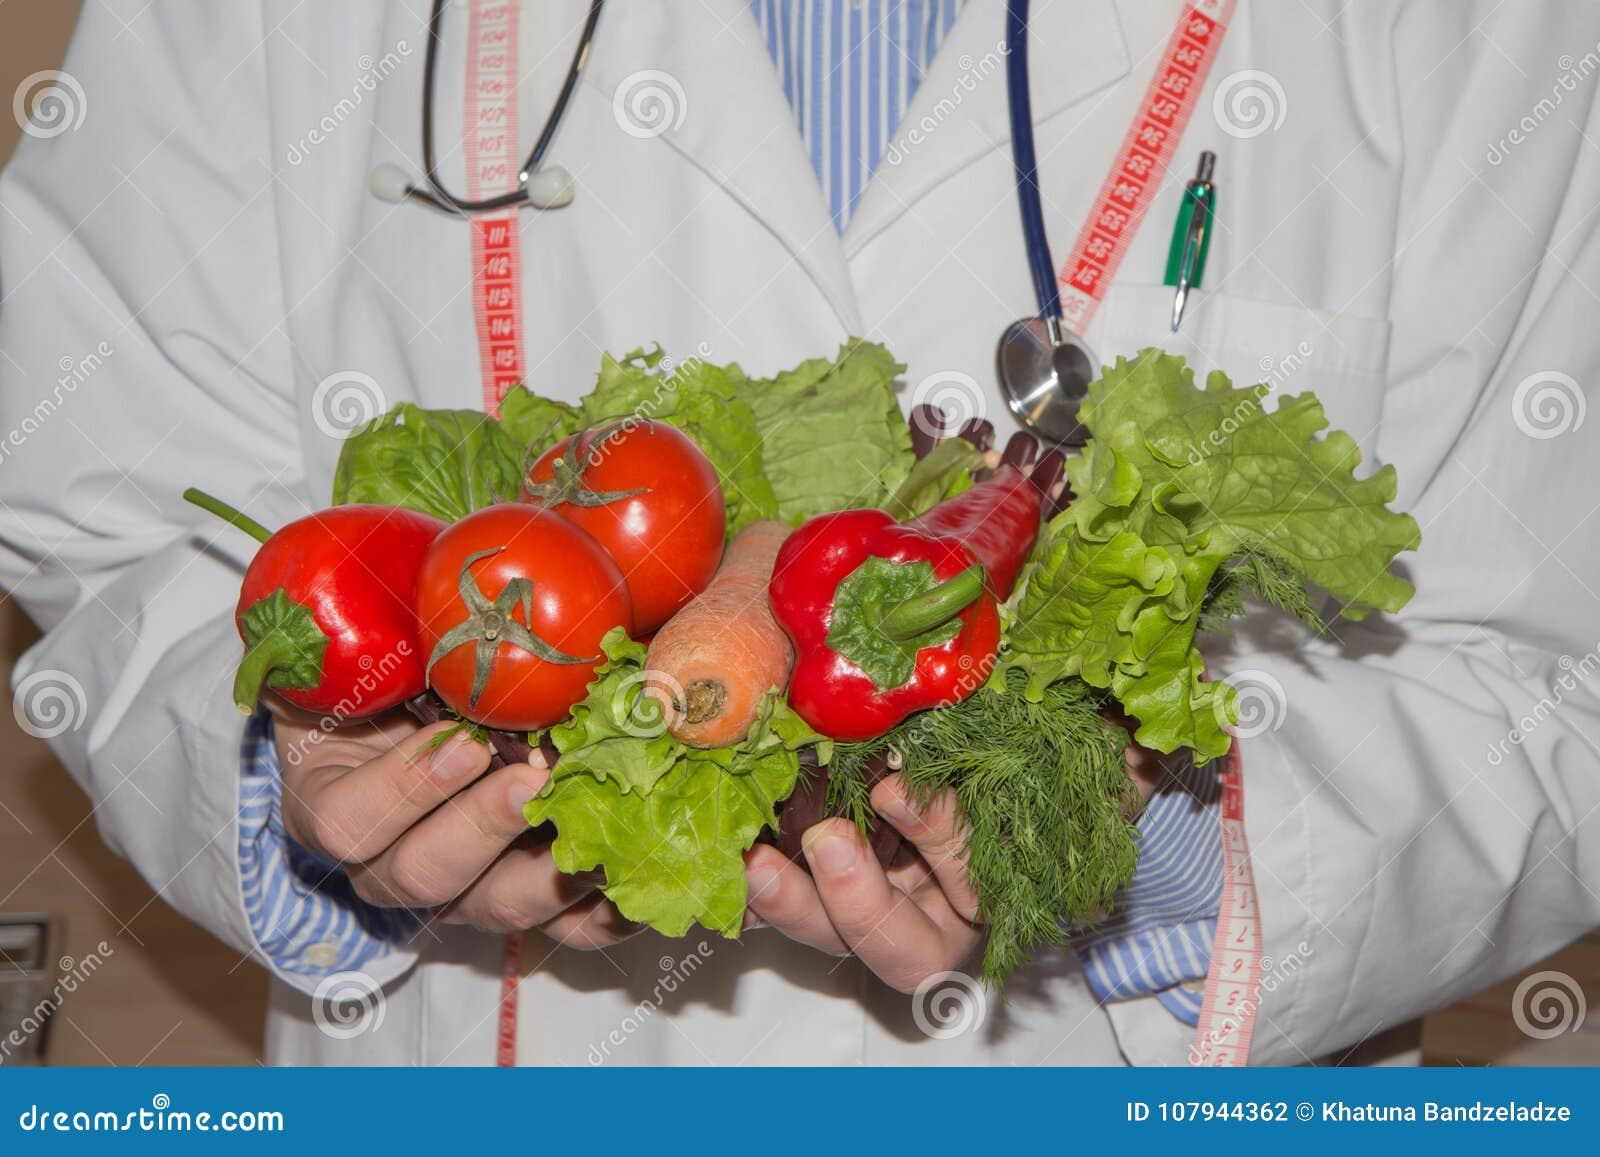 Nutrition: Tips for Improving Your Health - familydoctor.org